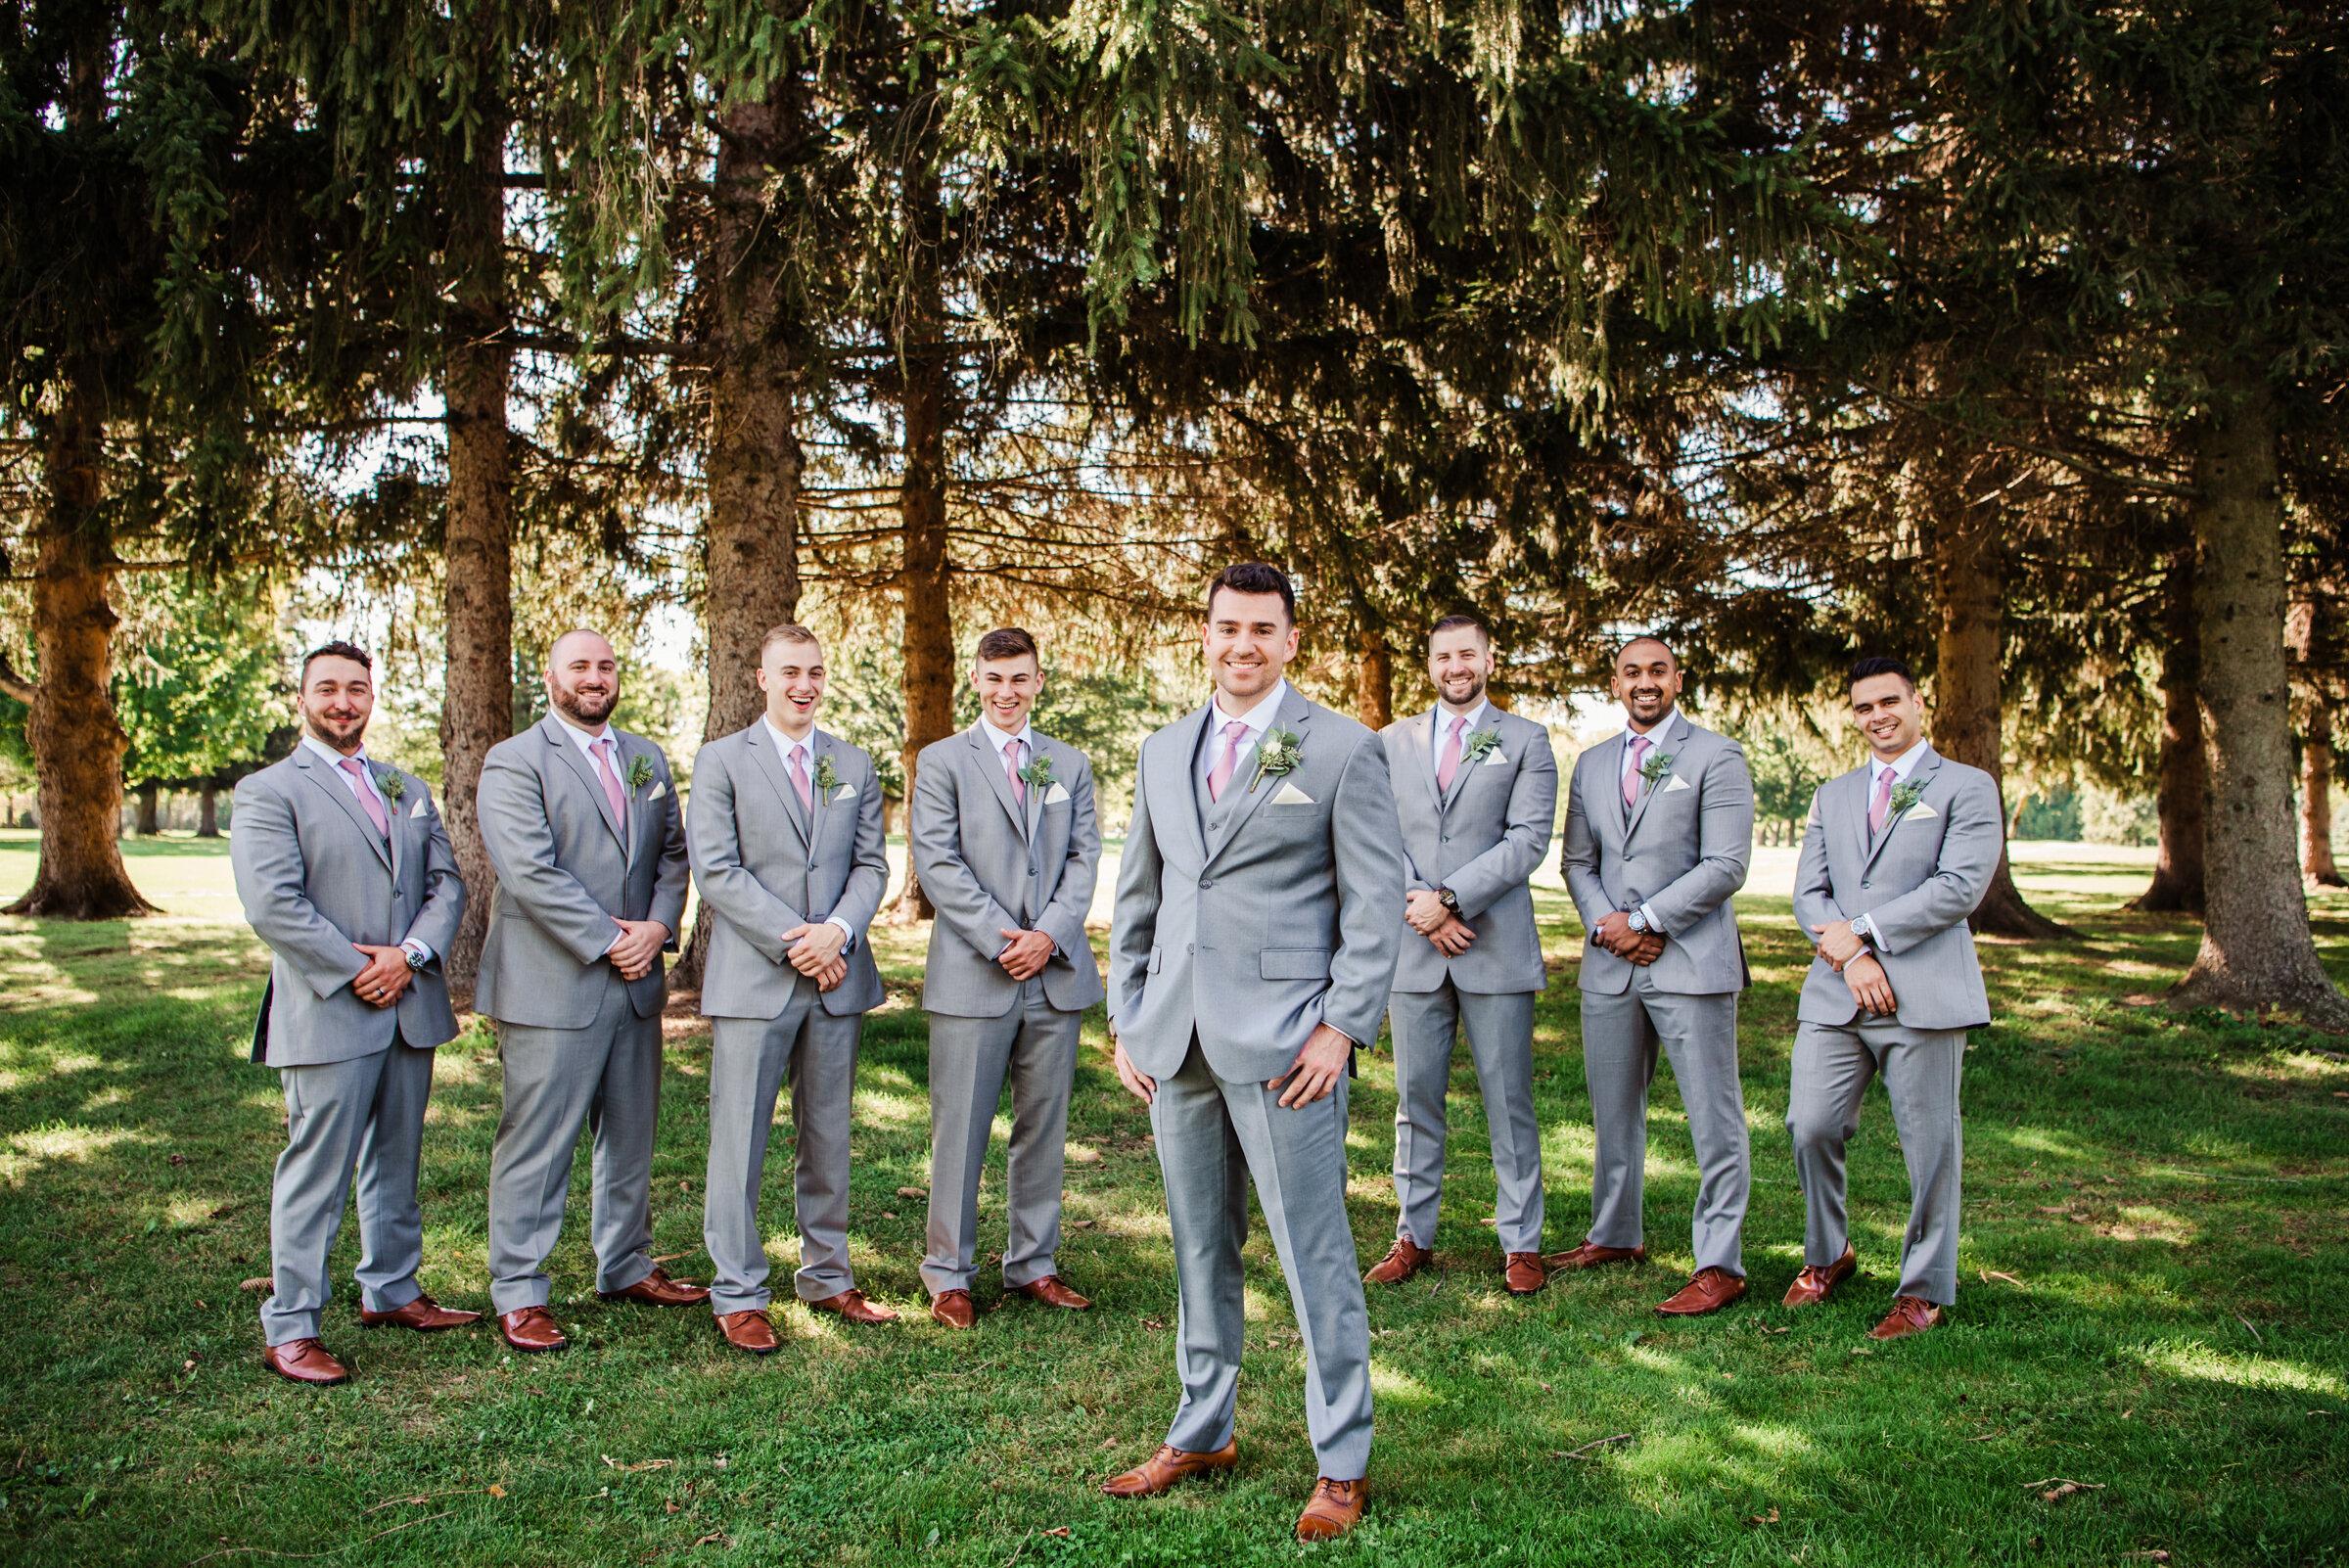 Deerfield_Country_Club_Rochester_Wedding_JILL_STUDIO_Rochester_NY_Photographer_DSC_6165.jpg